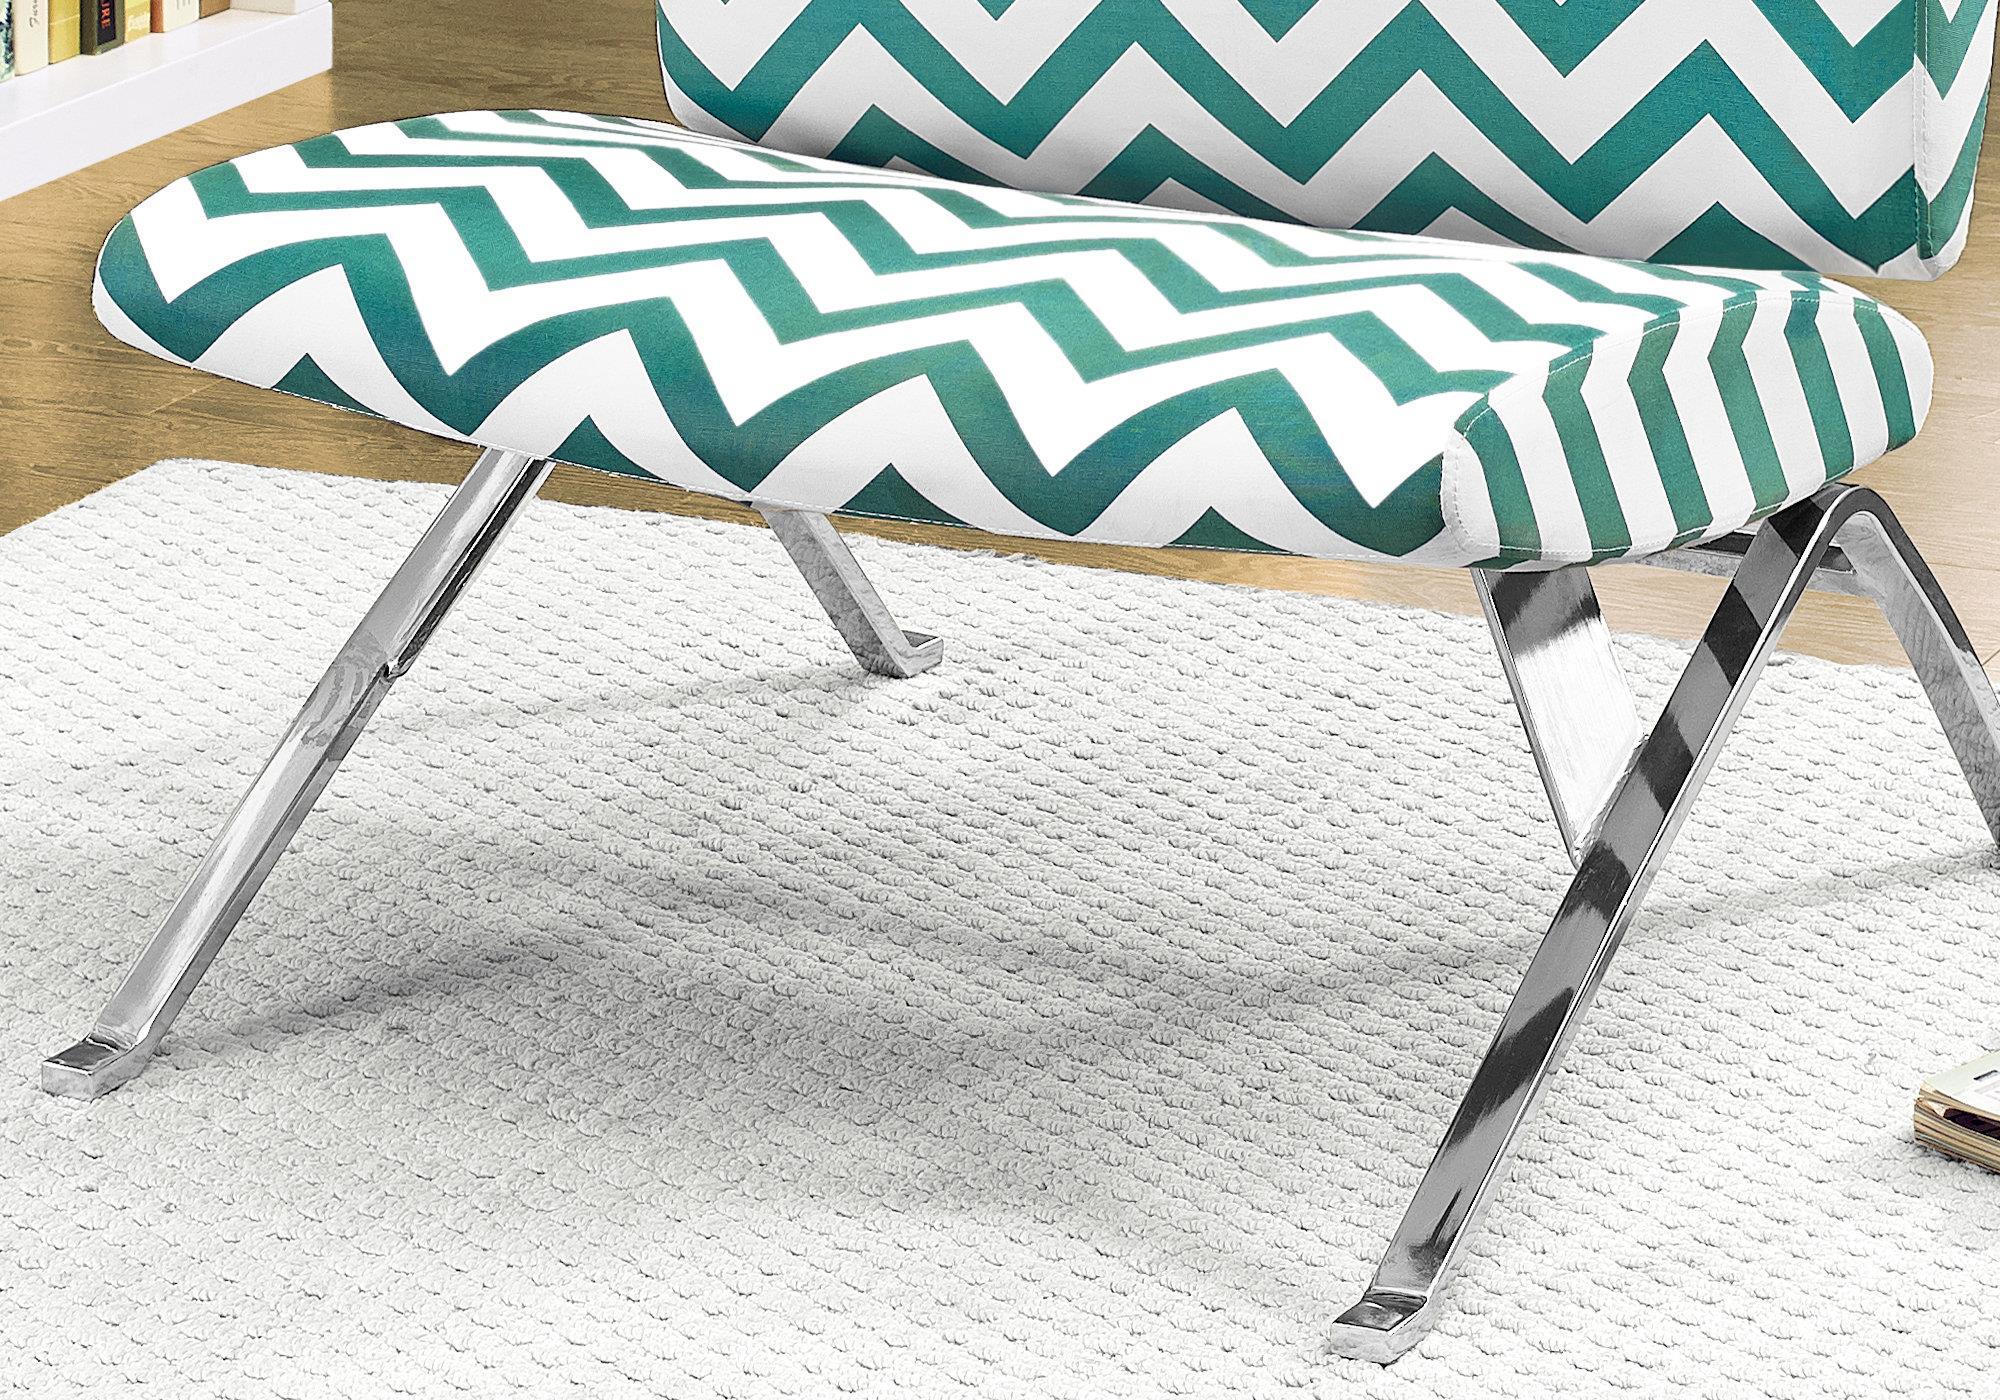 Enjoyable Monarch Specialties Accent Chair Fabric Chrome Metal Teal Inzonedesignstudio Interior Chair Design Inzonedesignstudiocom